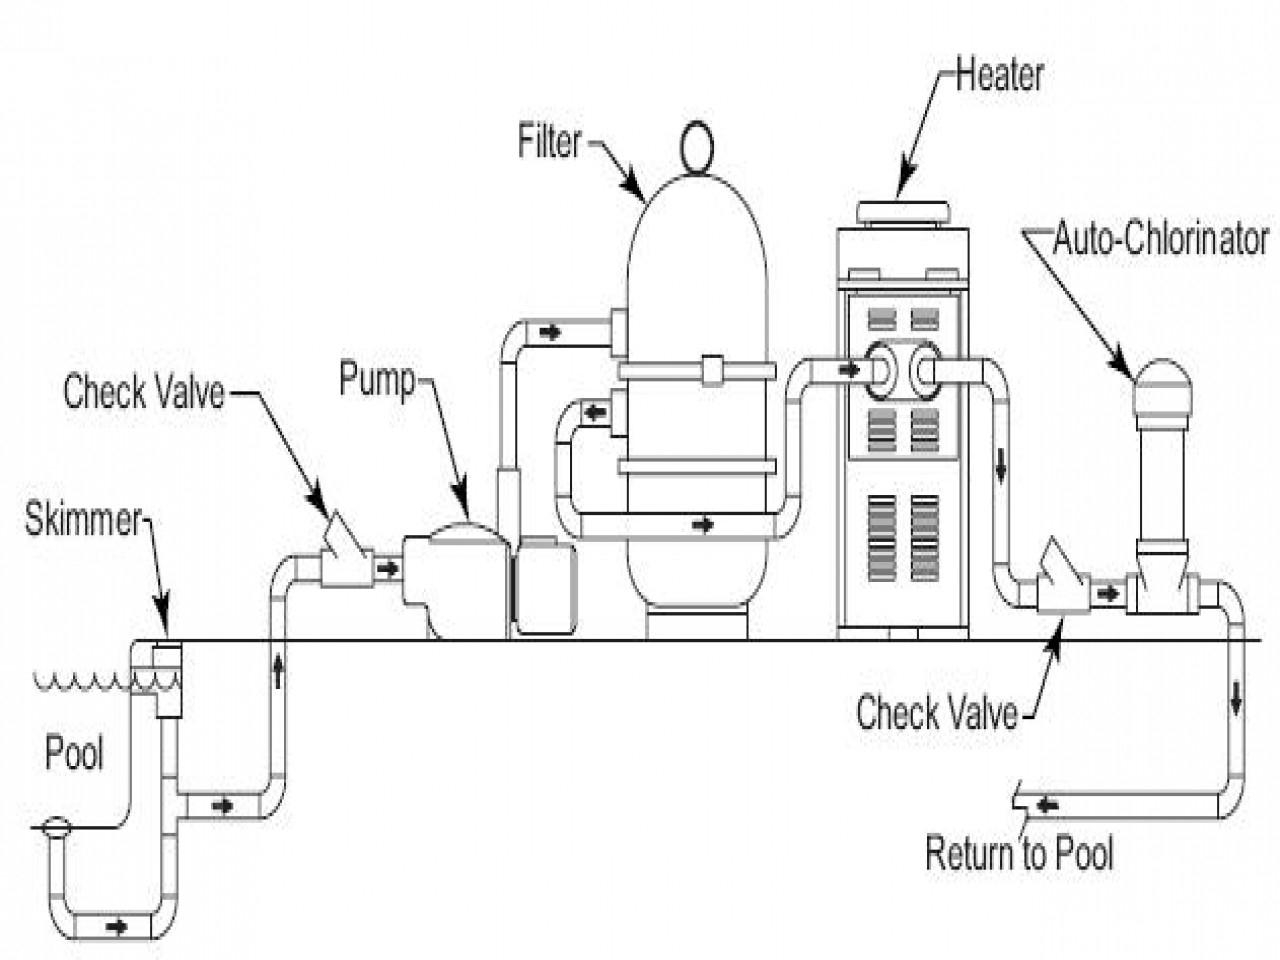 Pool Pump Schematic